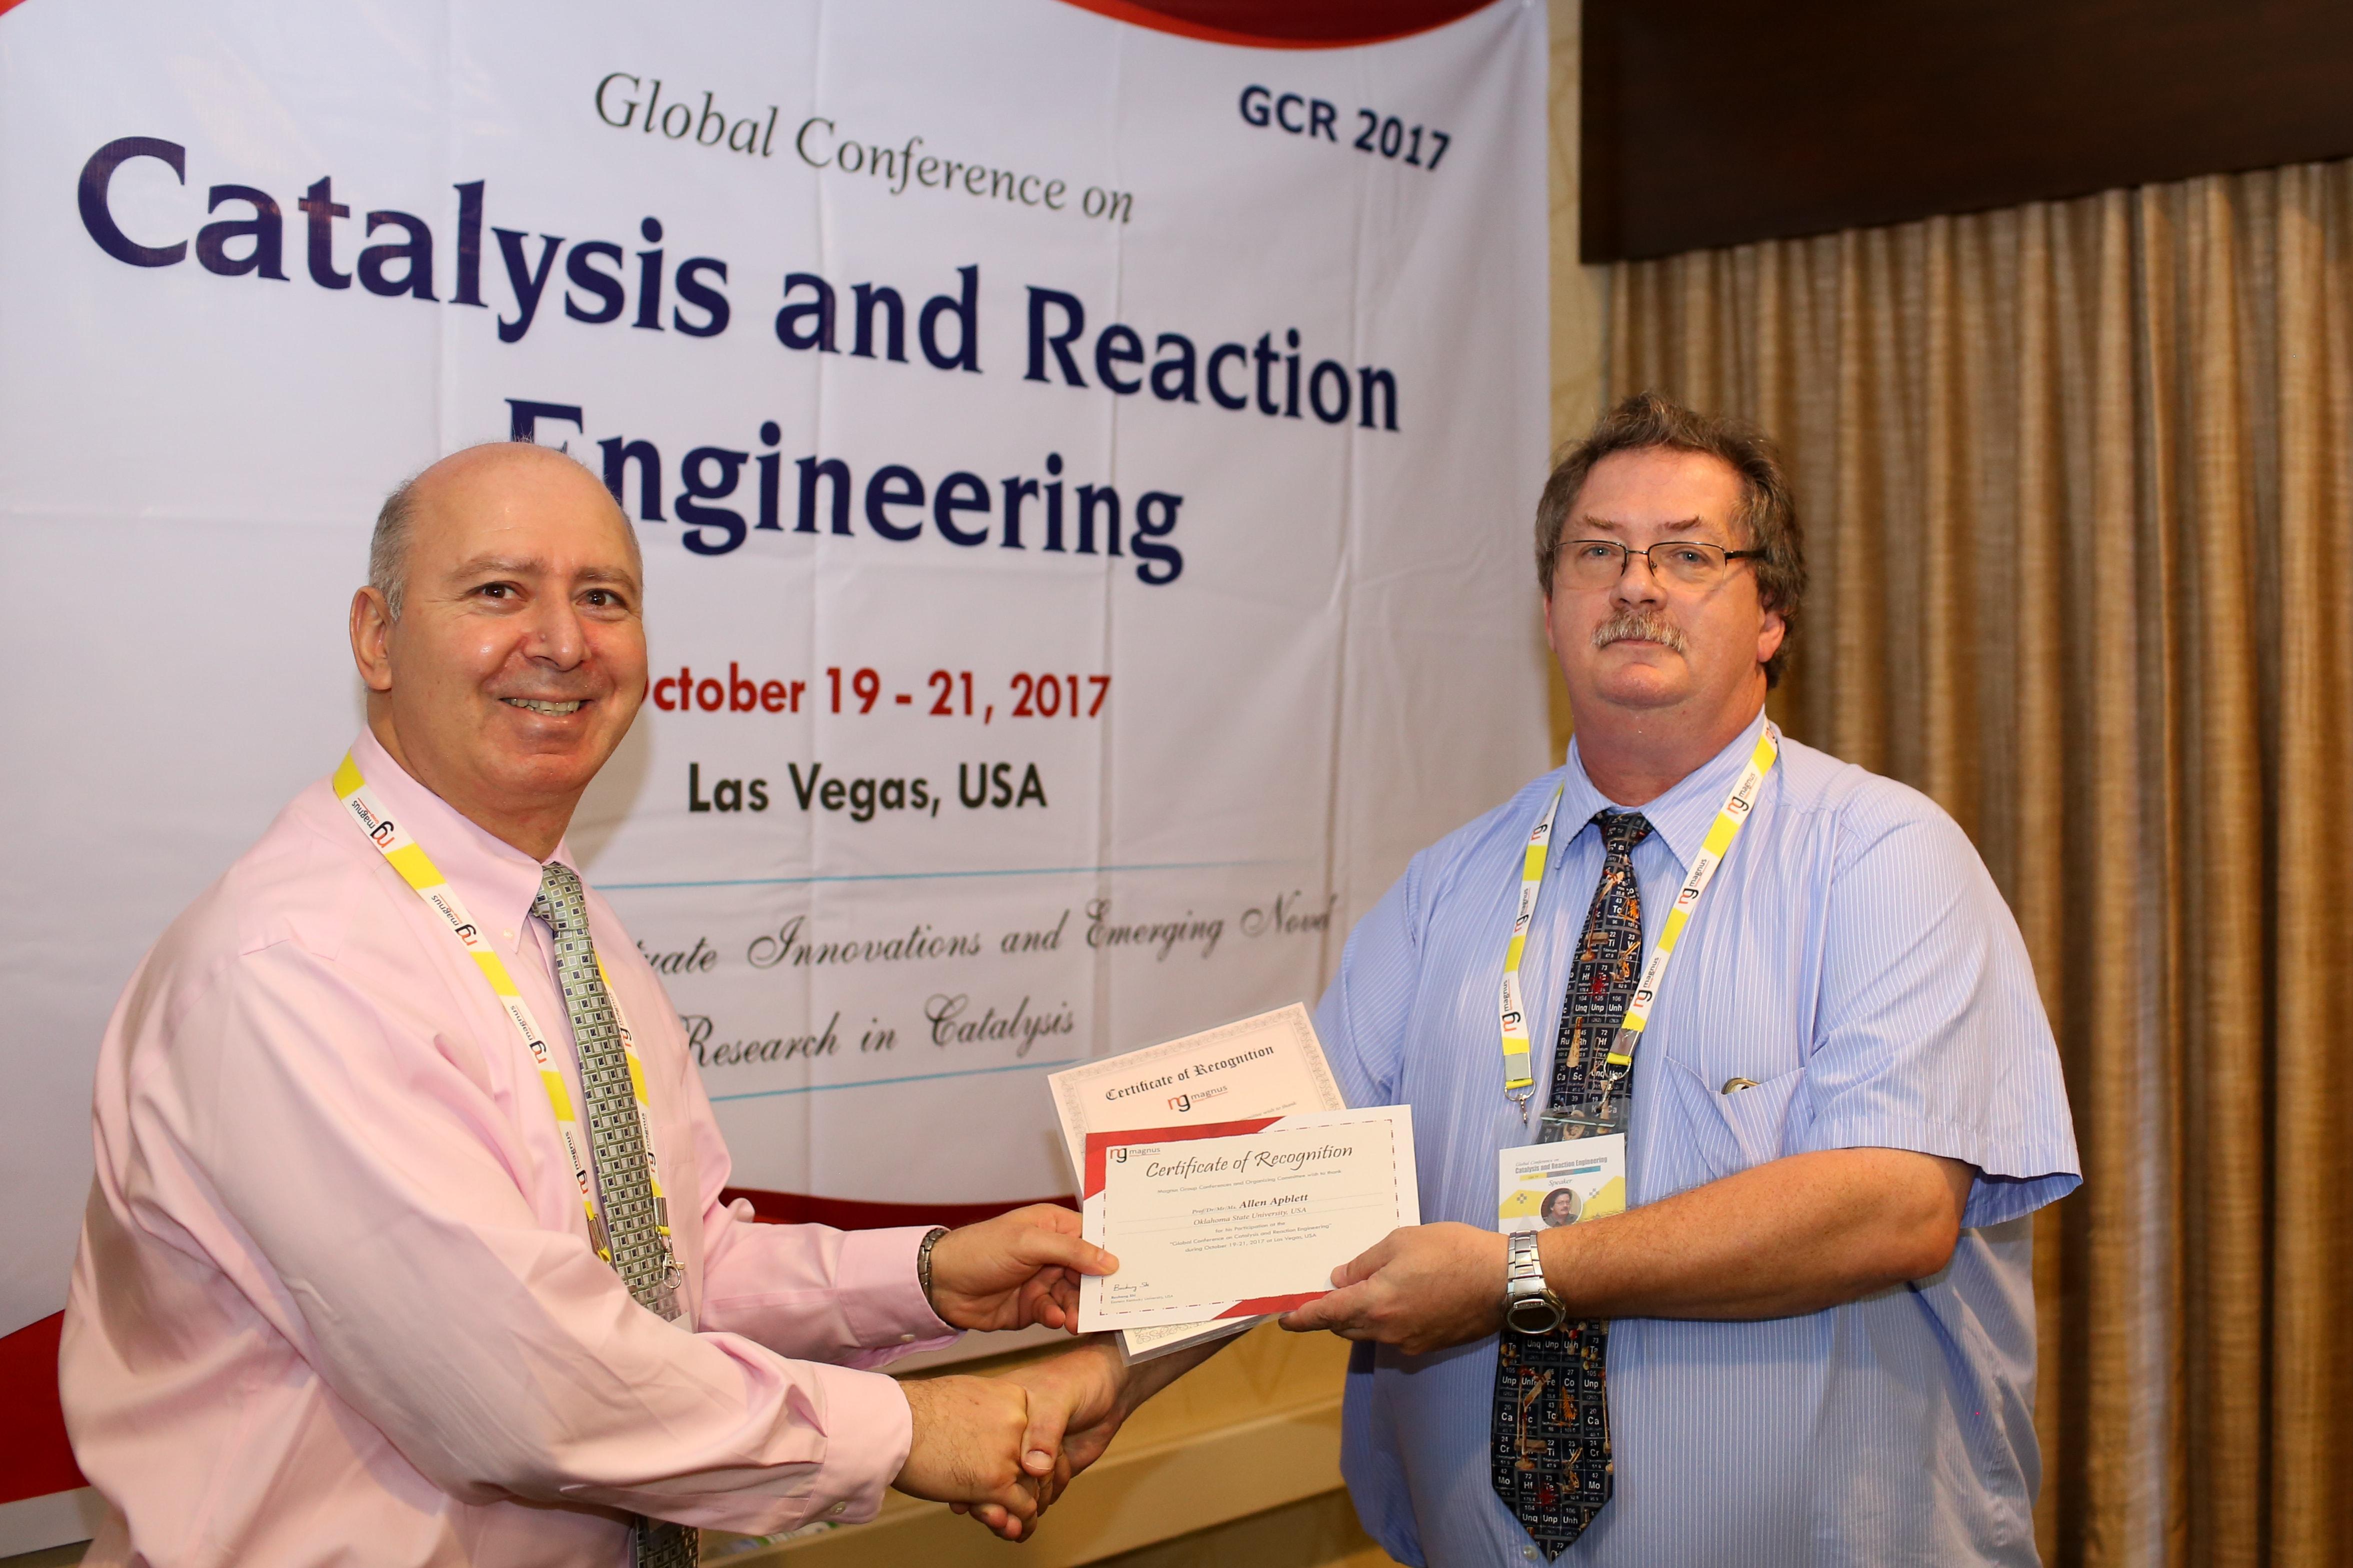 Catalysis Conference 2017, Las Vegas, USA